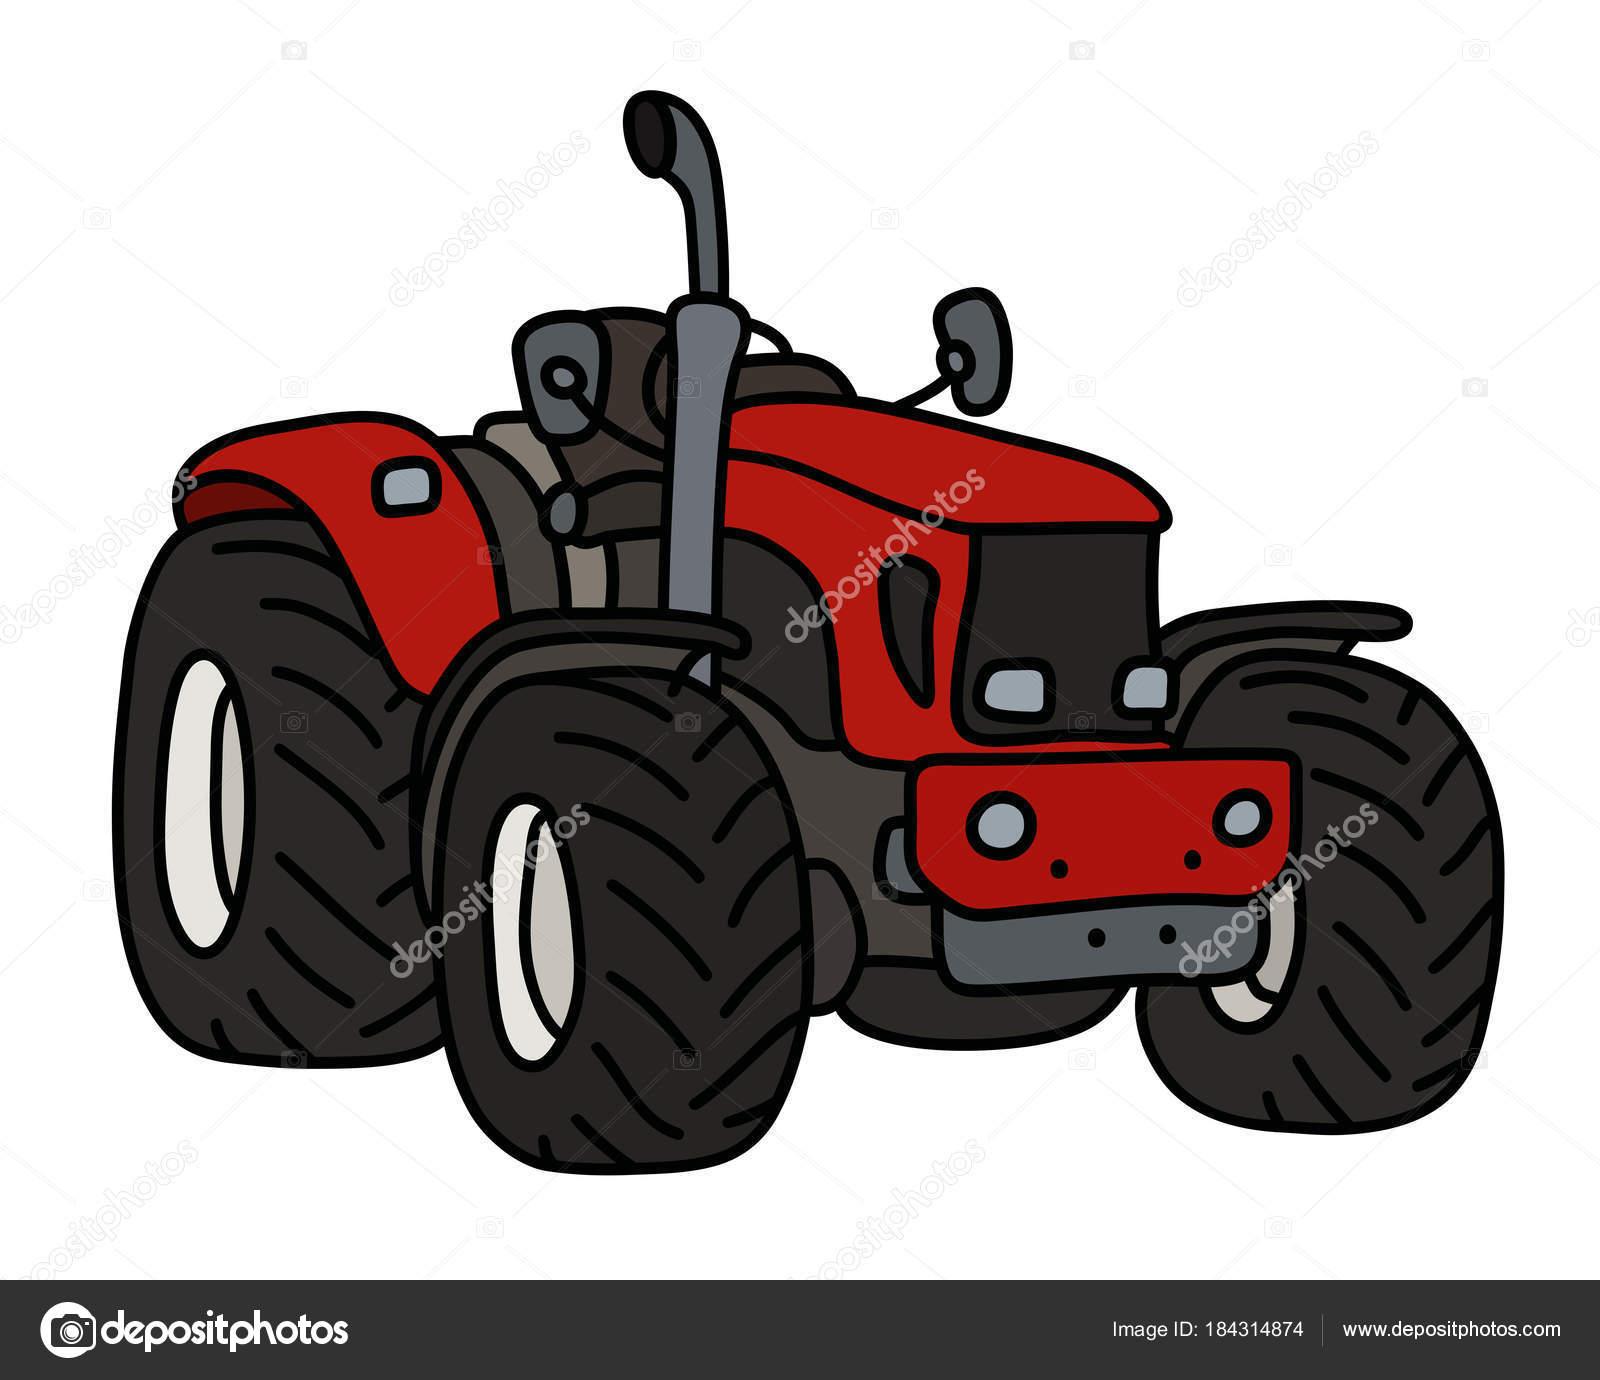 Dessin tracteur tondeuse simple tom gratuit tracteur tom - Jeu de tracteur agricole gratuit ...